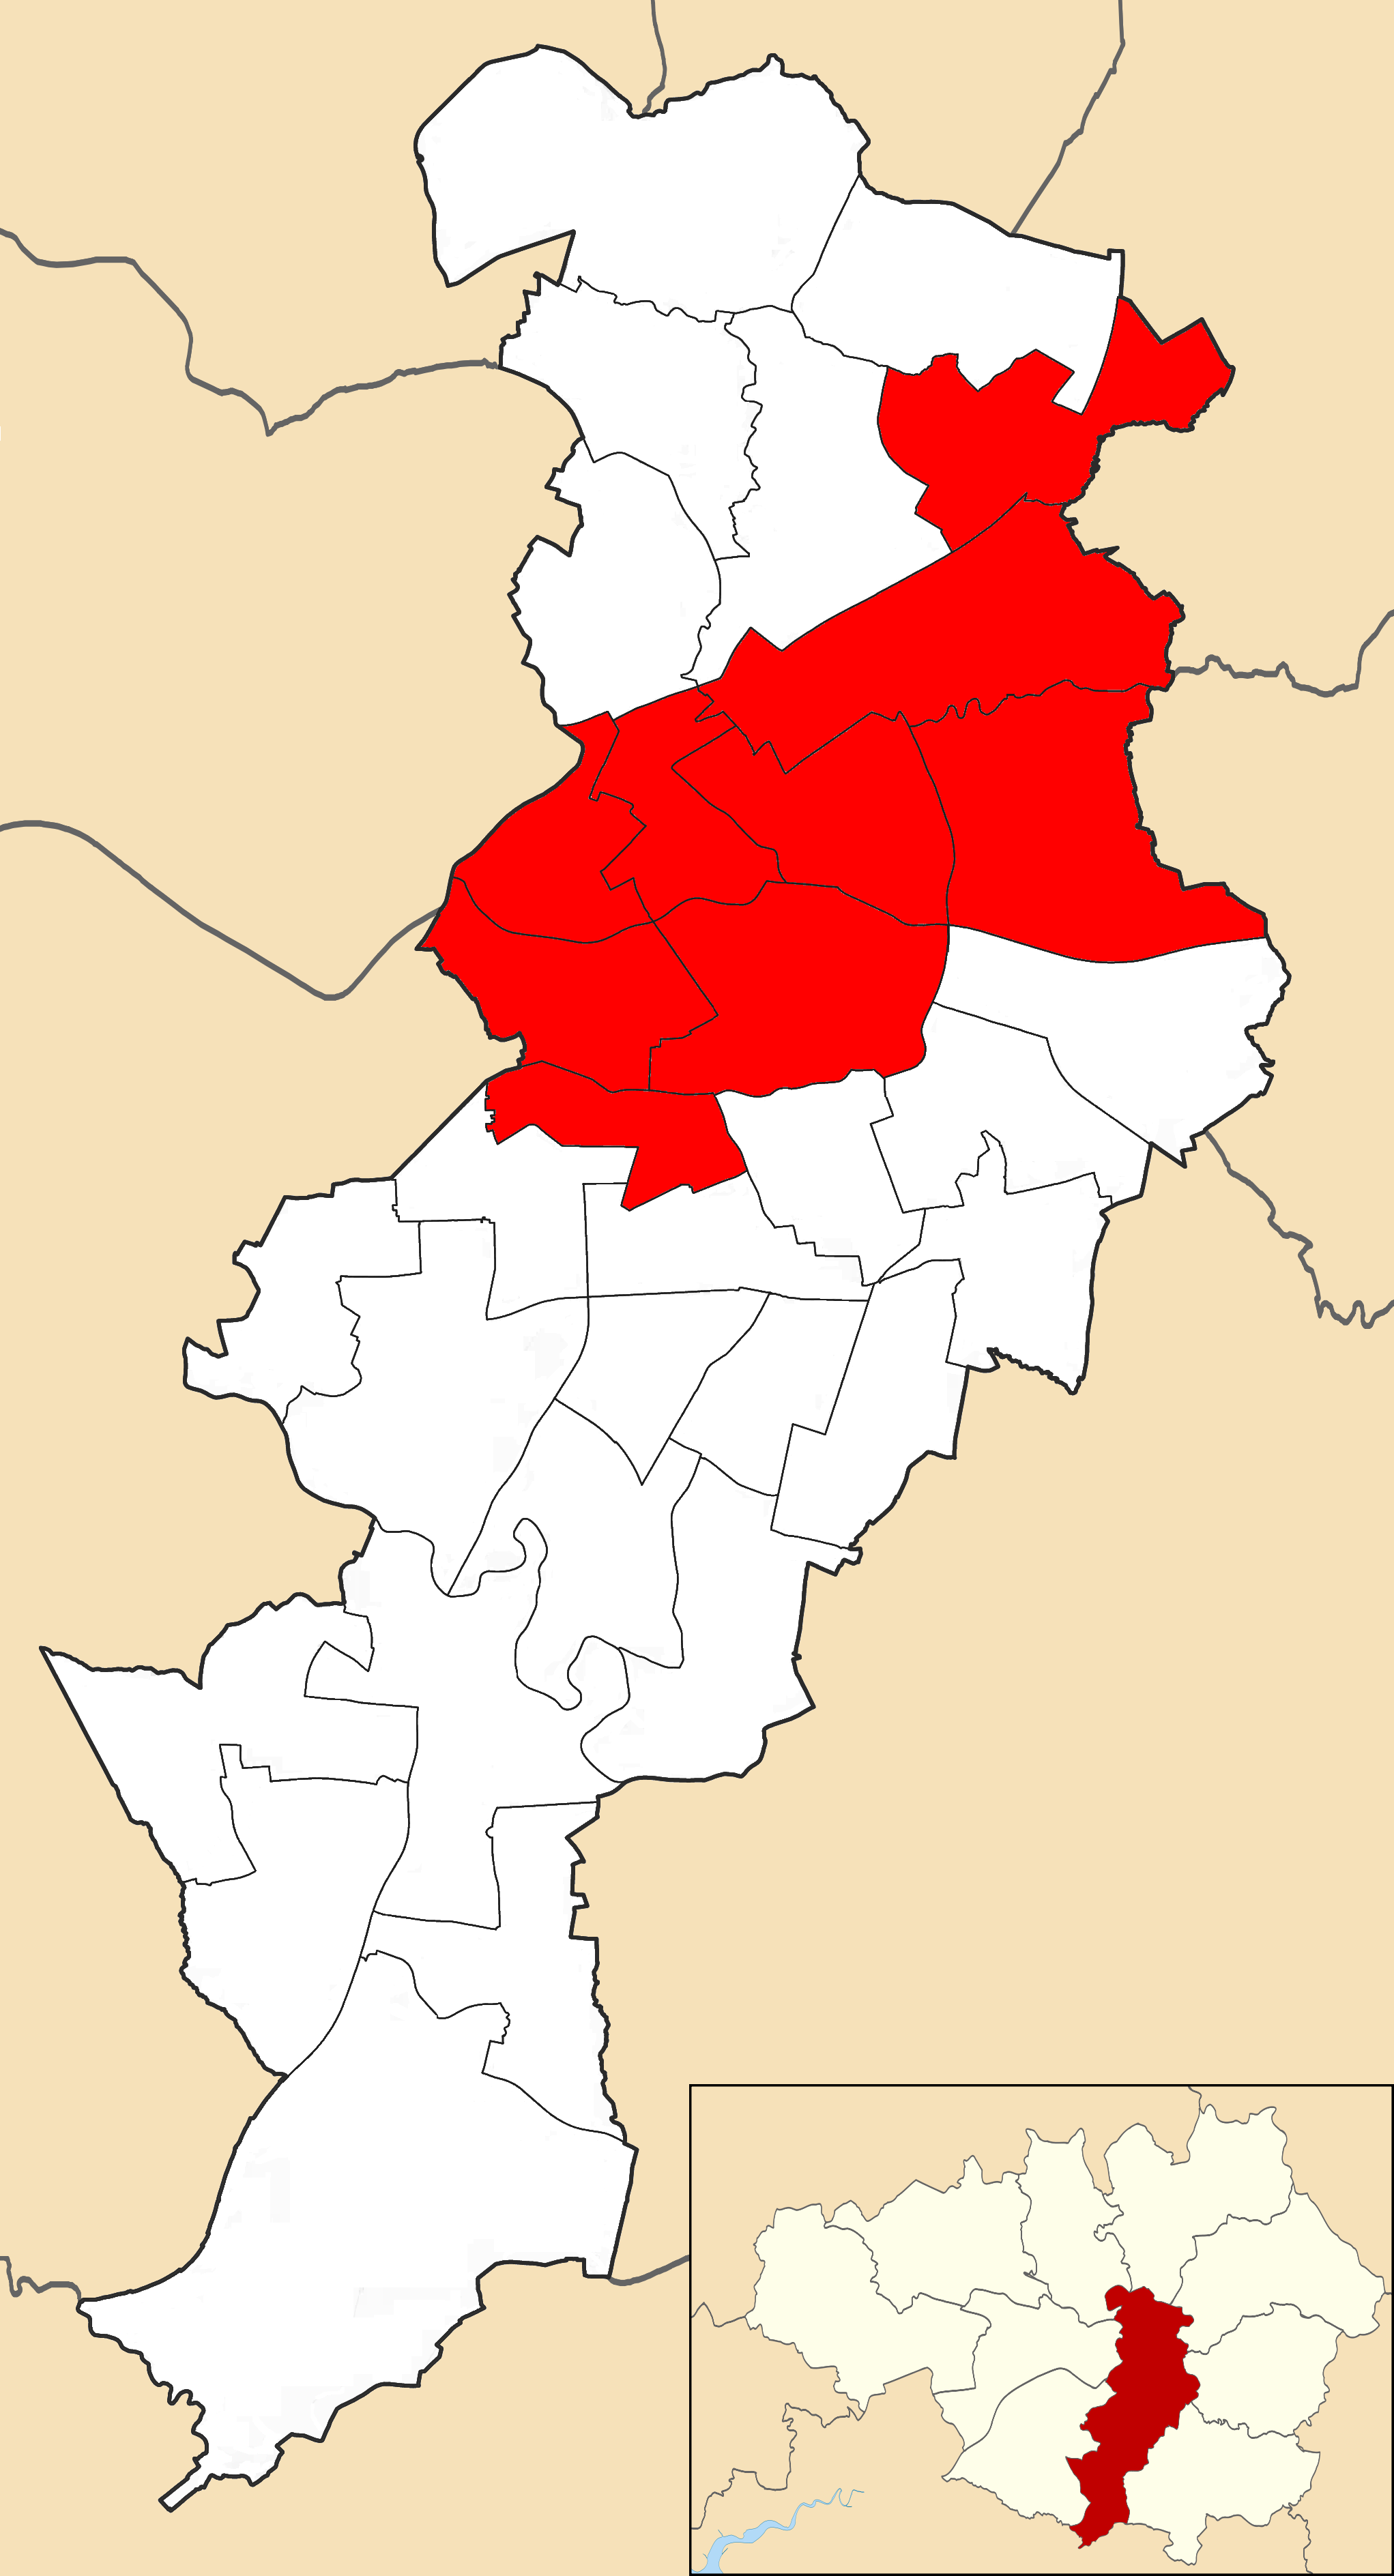 Map Of Uk Parliamentary Constituencies.File Manchester Central Uk Parliament Constituency 2018 Png